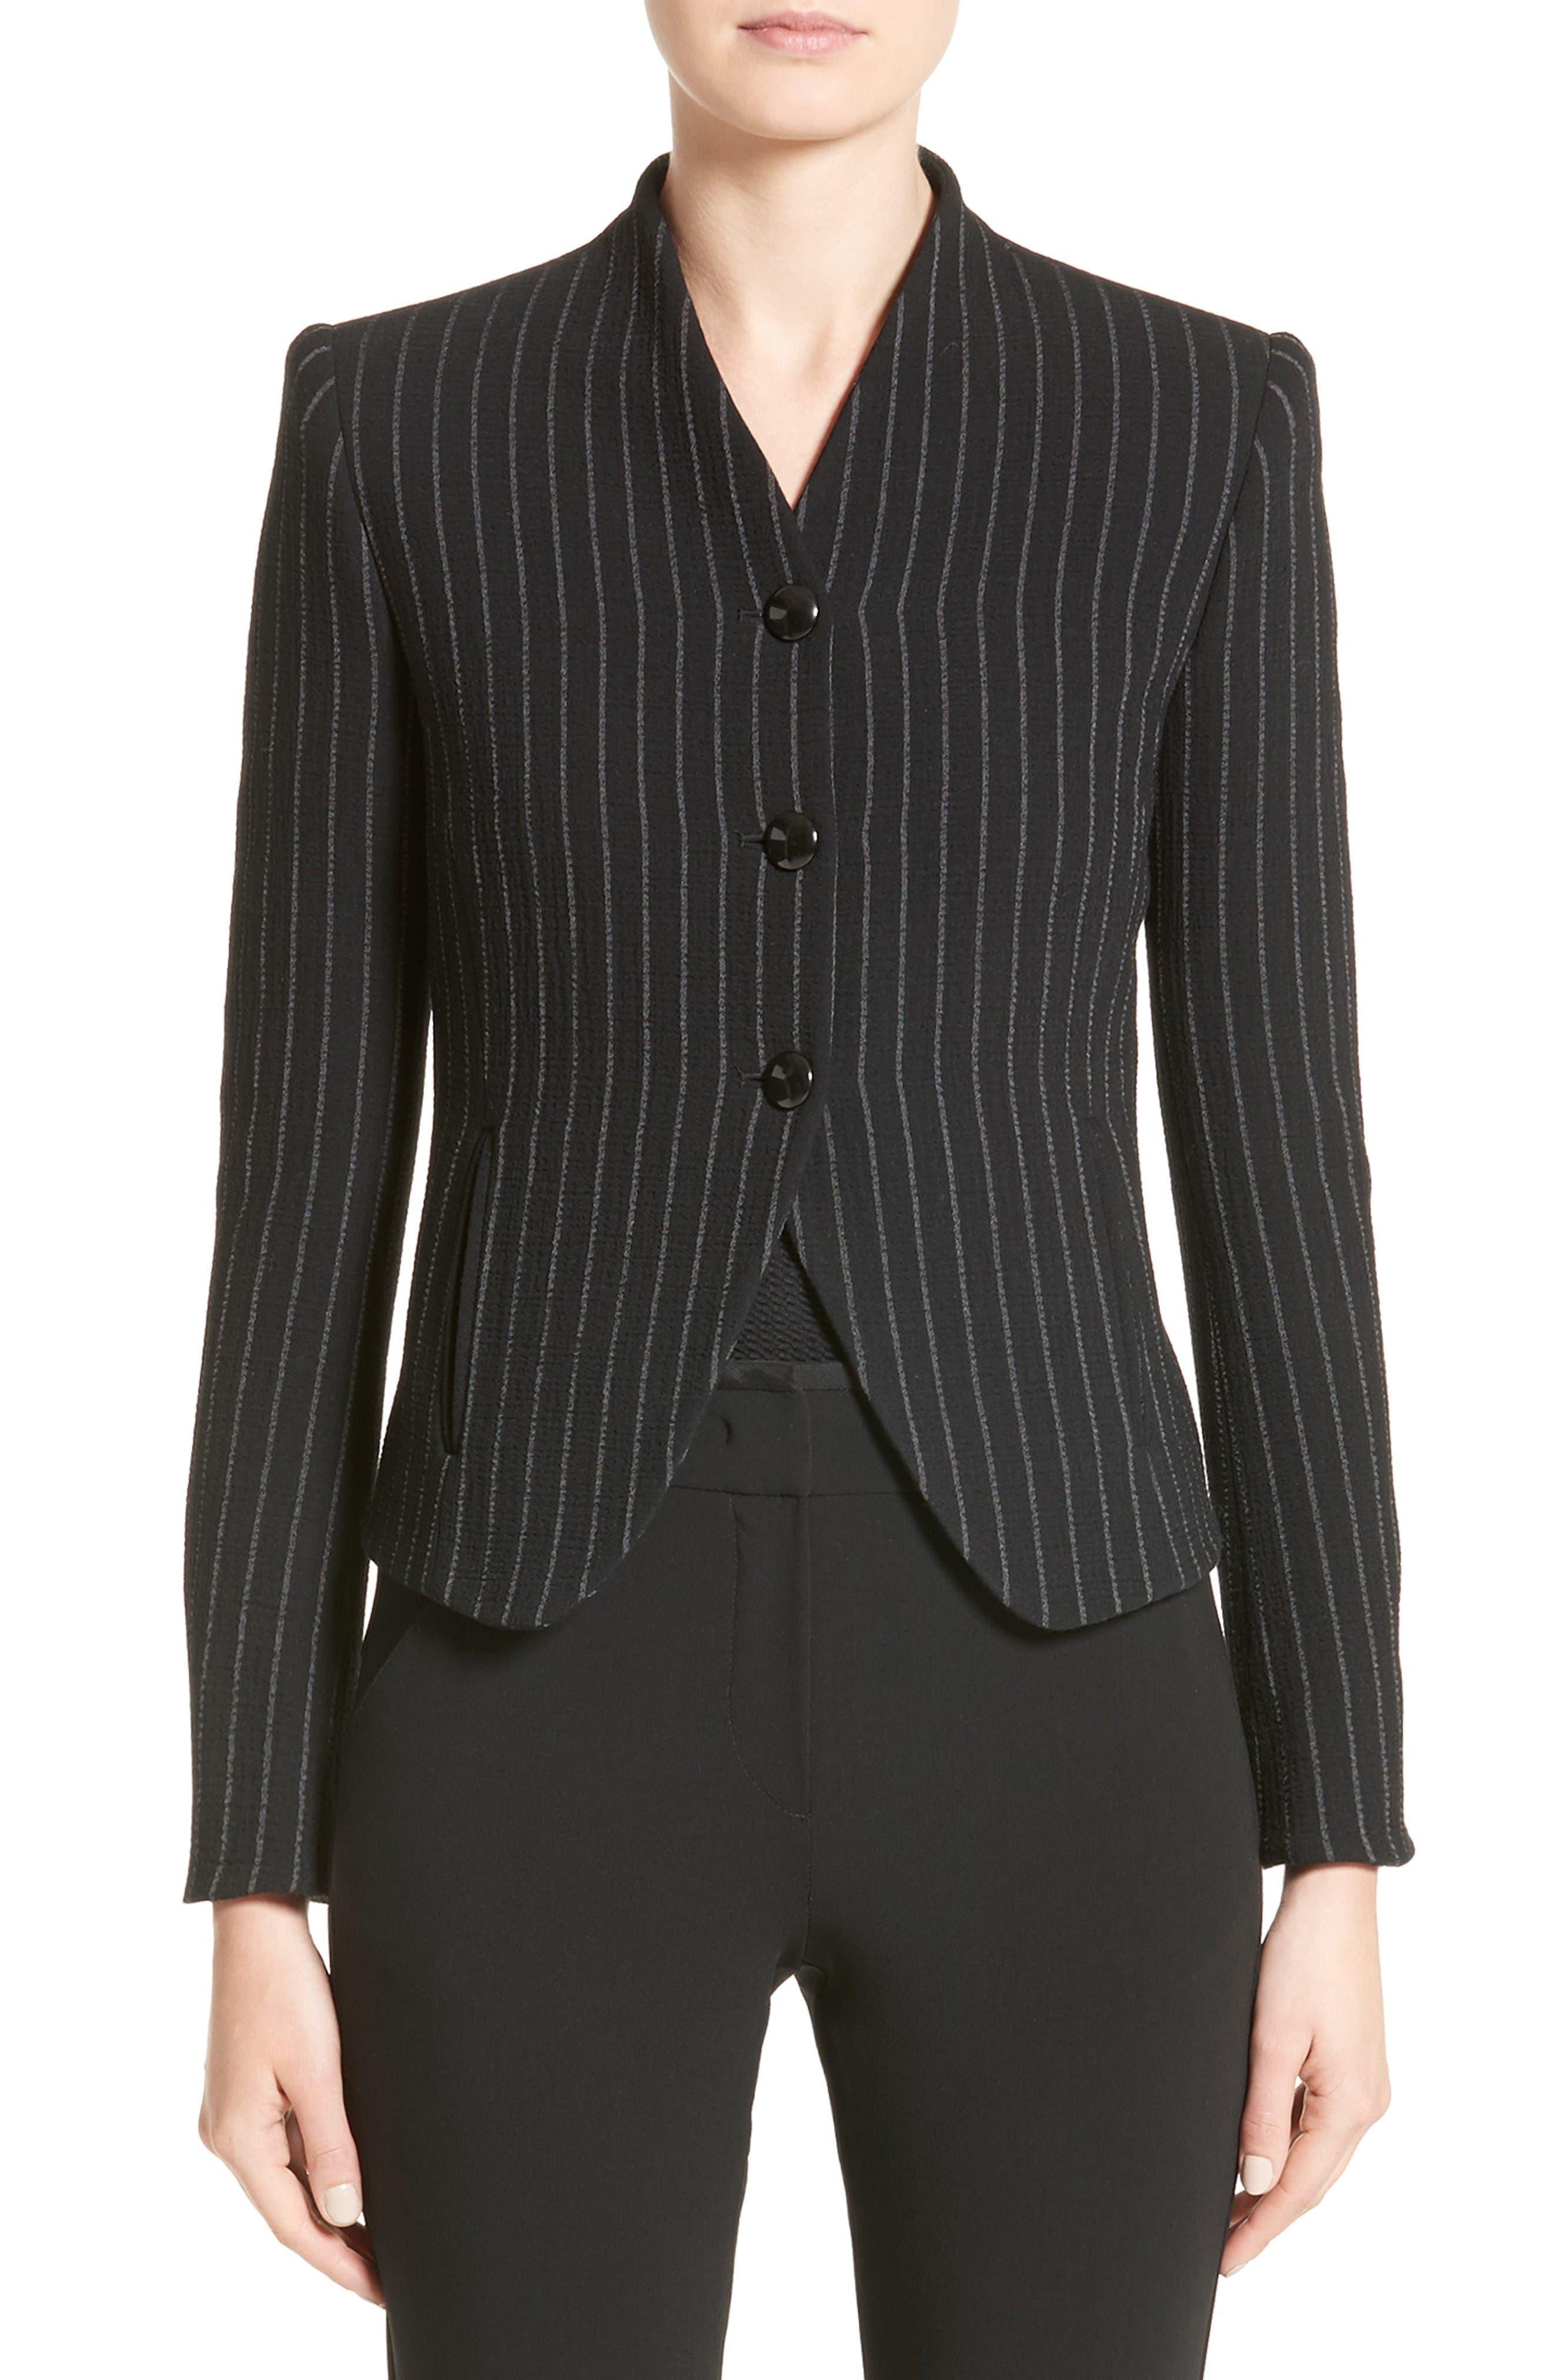 Armani Collezioni Stretch Wool Pinstripe Jacket